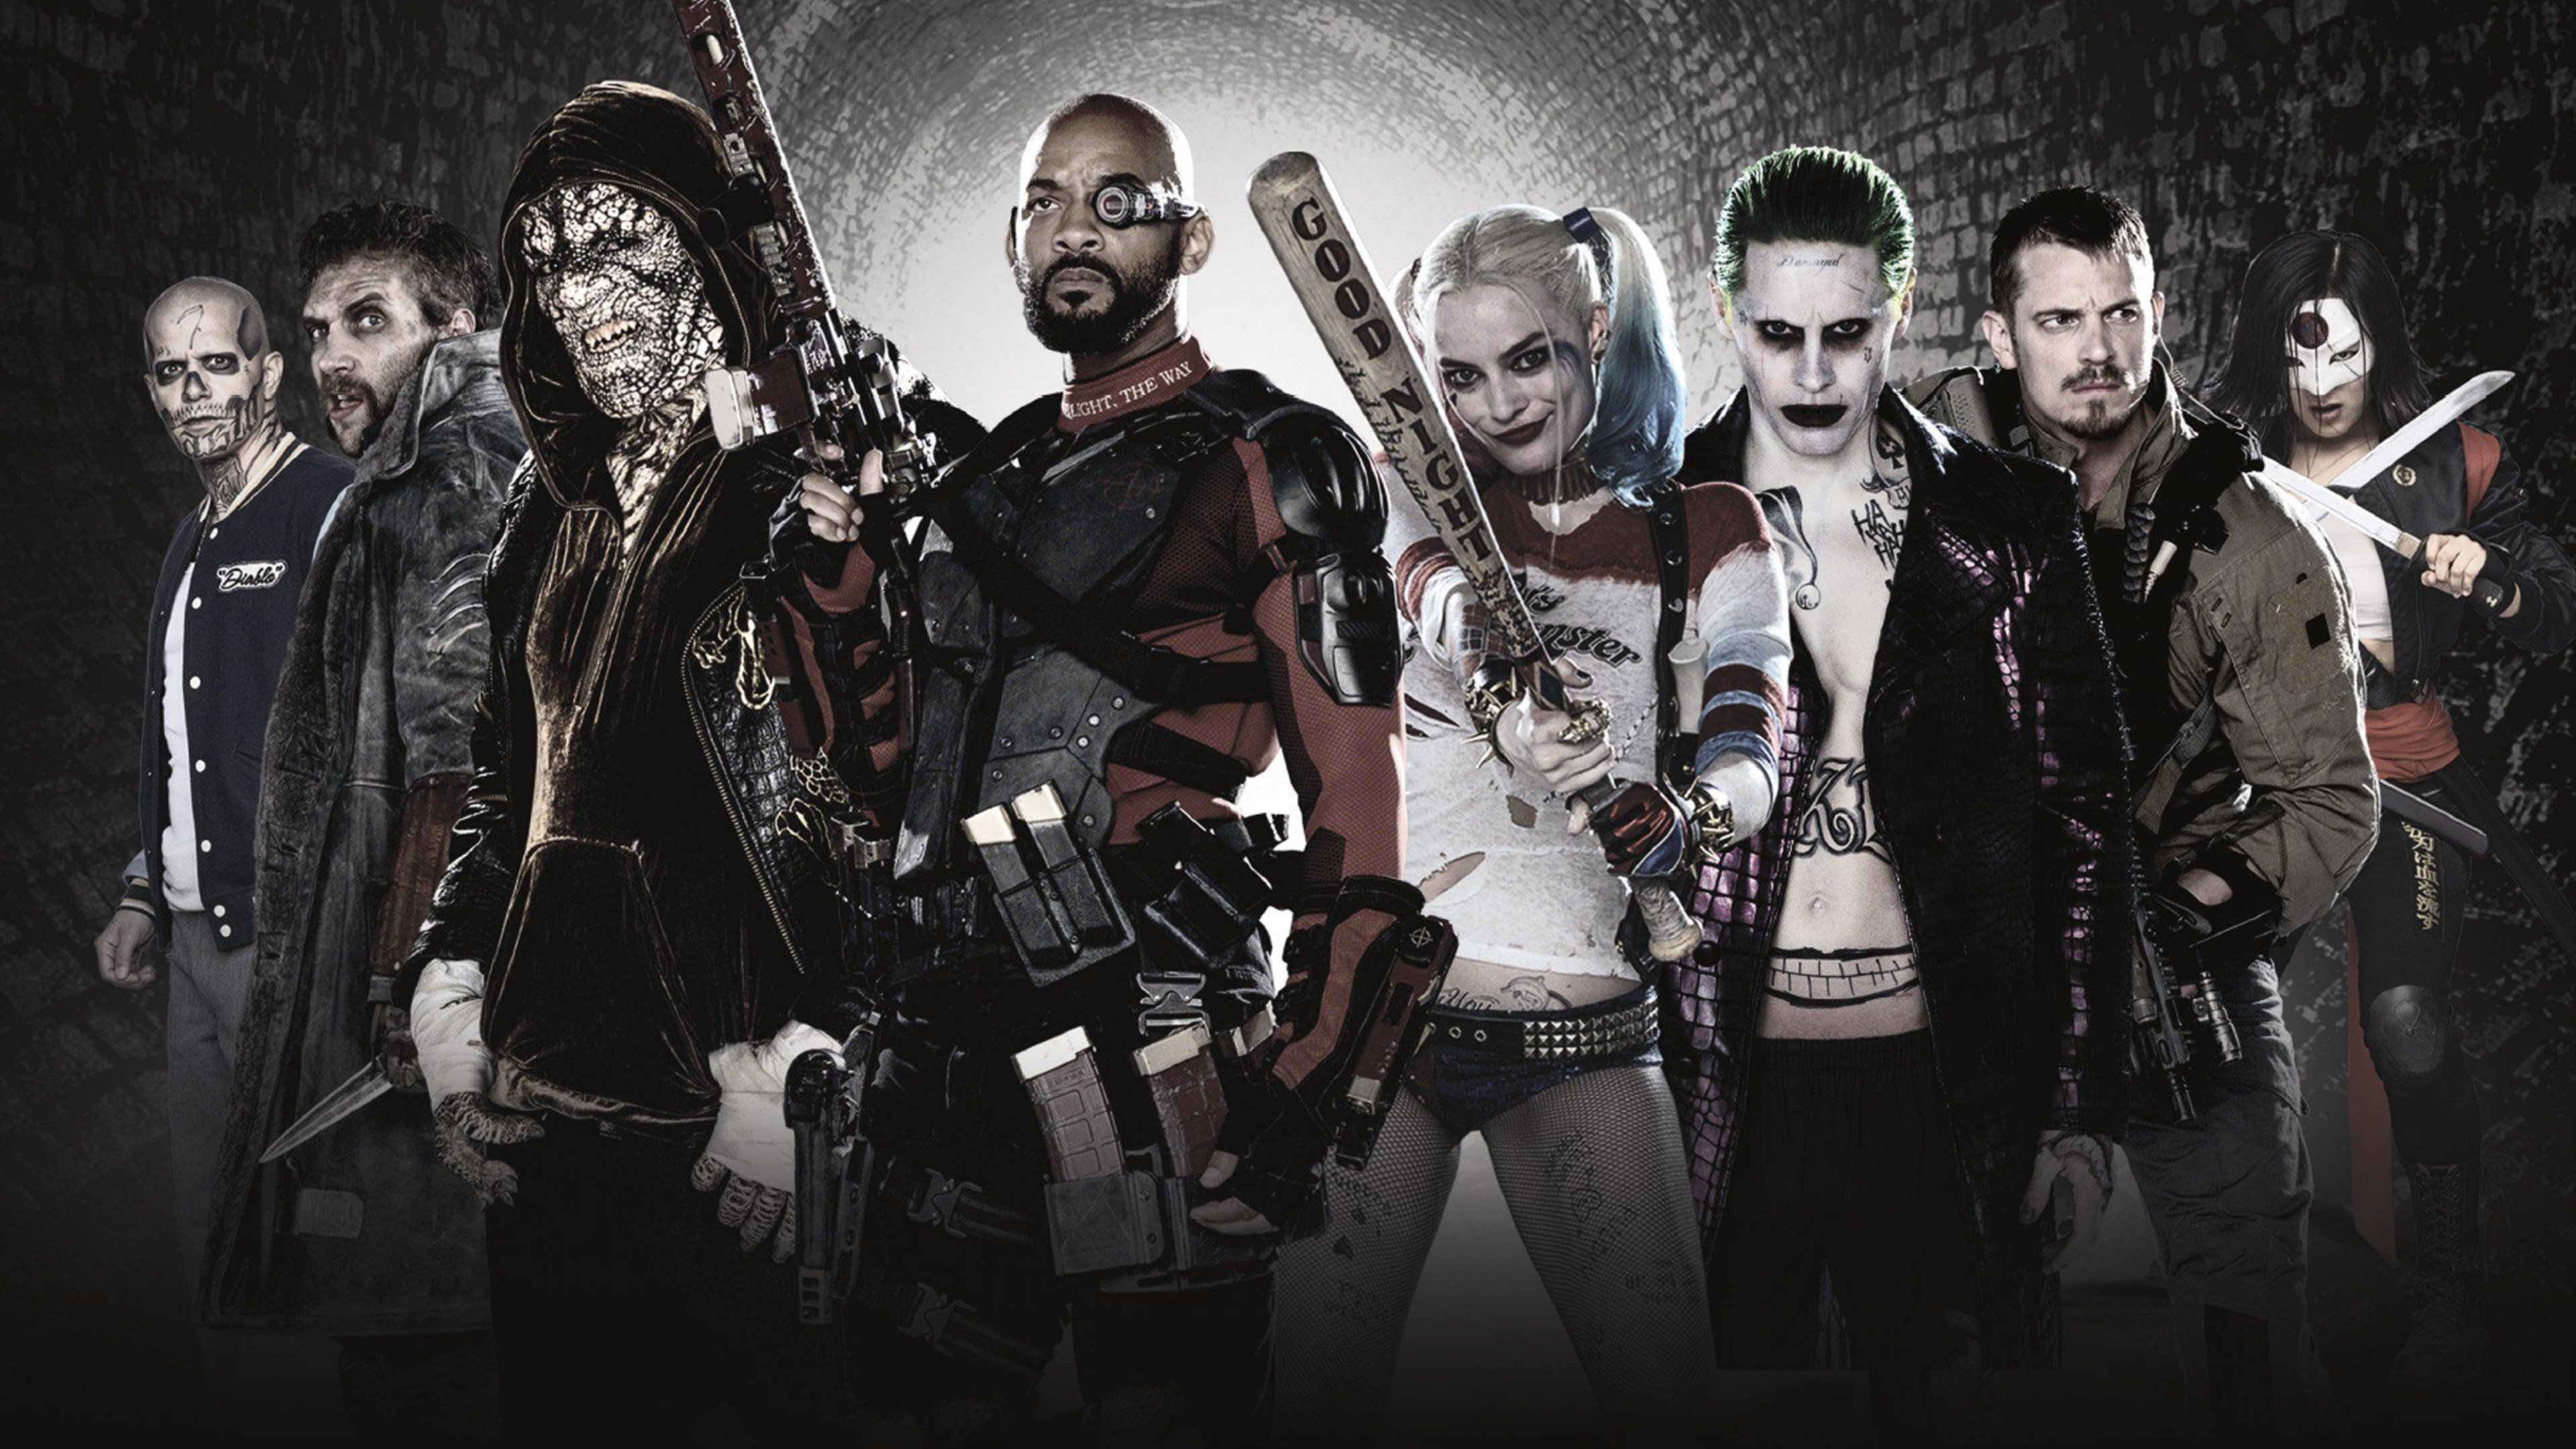 Suicide Squad wallpaper 10 3840x2160